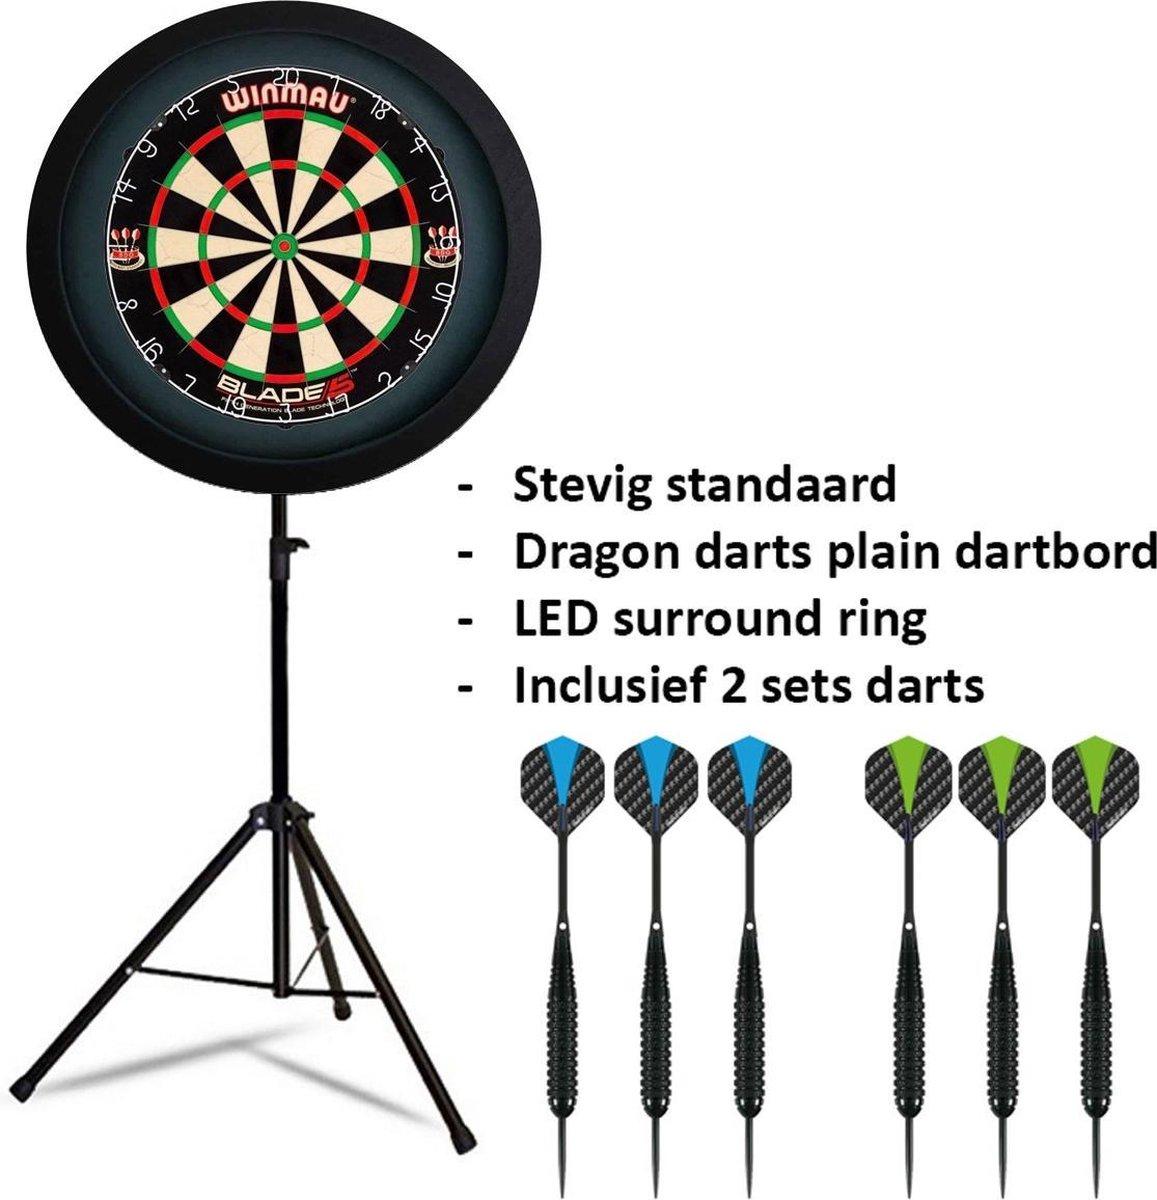 Dragon darts - Portable dartbord standaard LED pakket plus - inclusief Winmau Blade 5 - dartbord - LED surround ring - en - dartpijlen - zwart